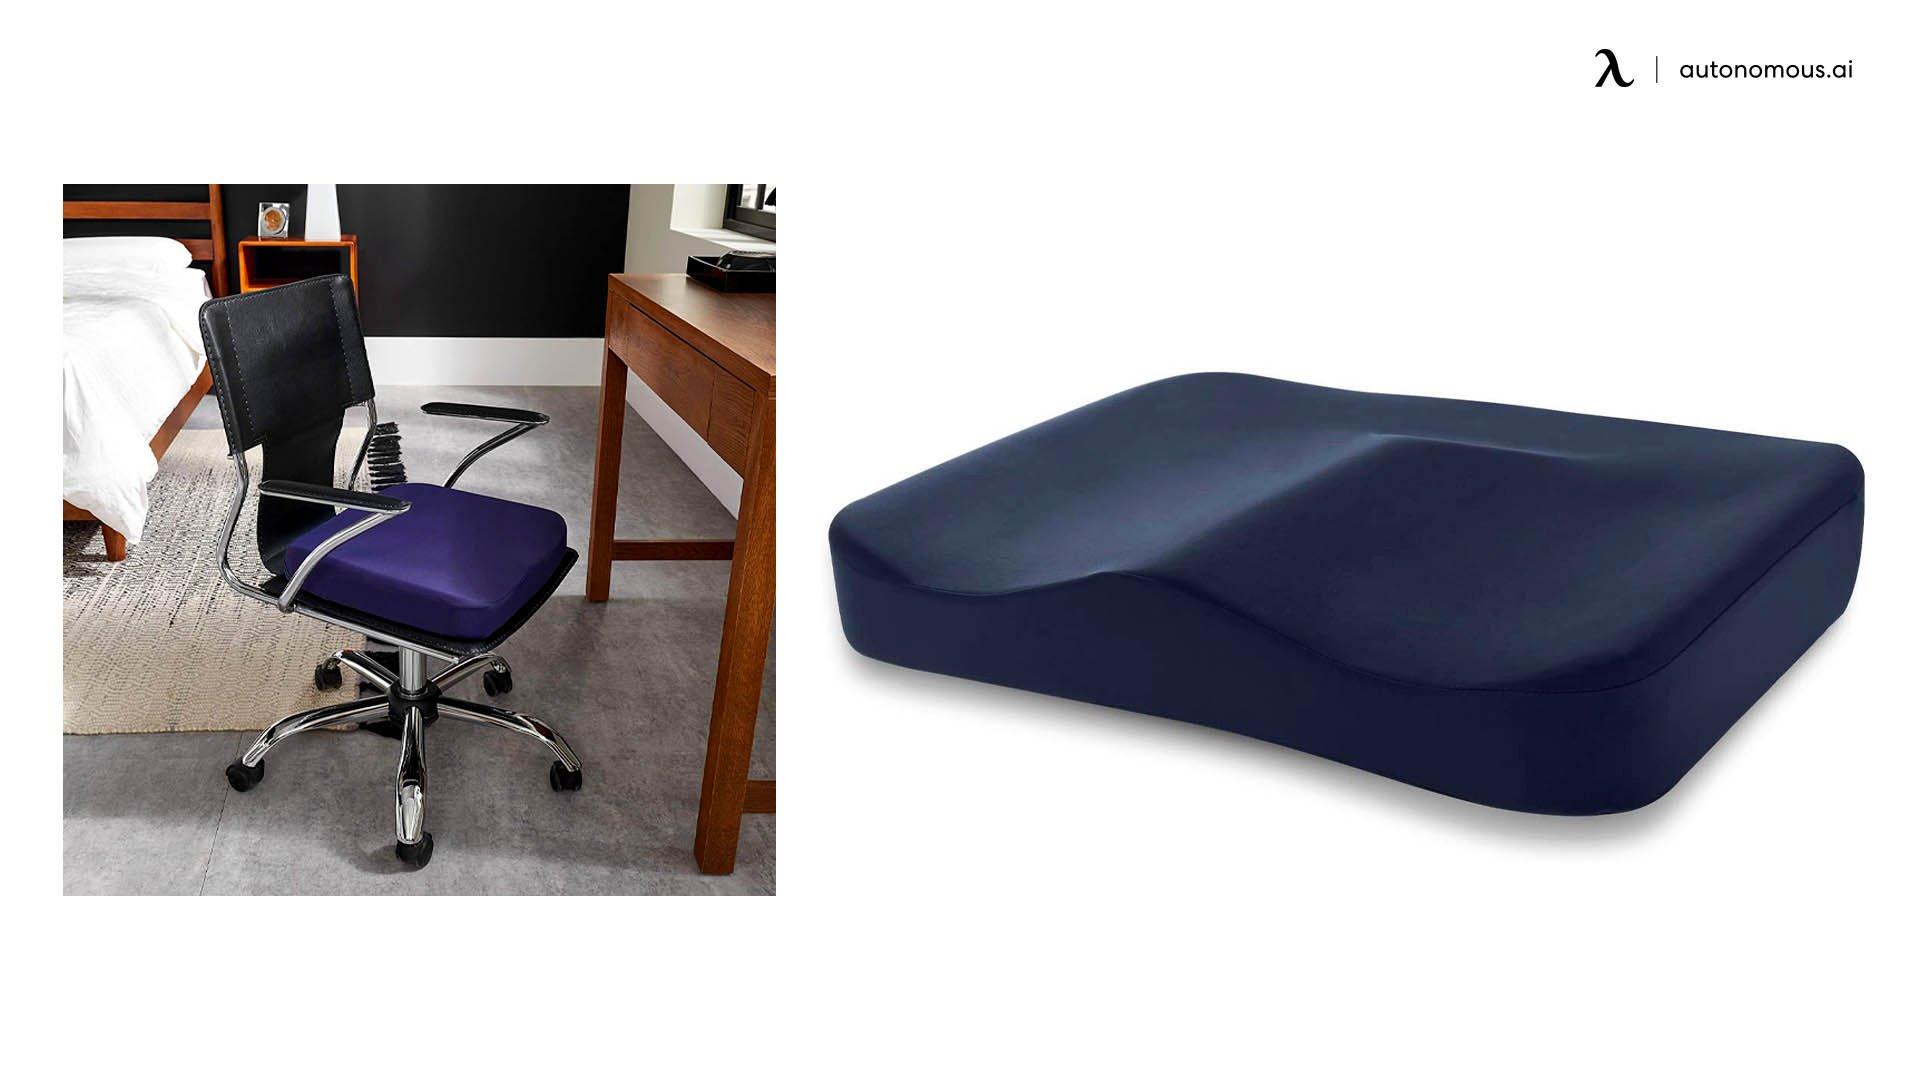 Temper-Pedic Seat Cushion